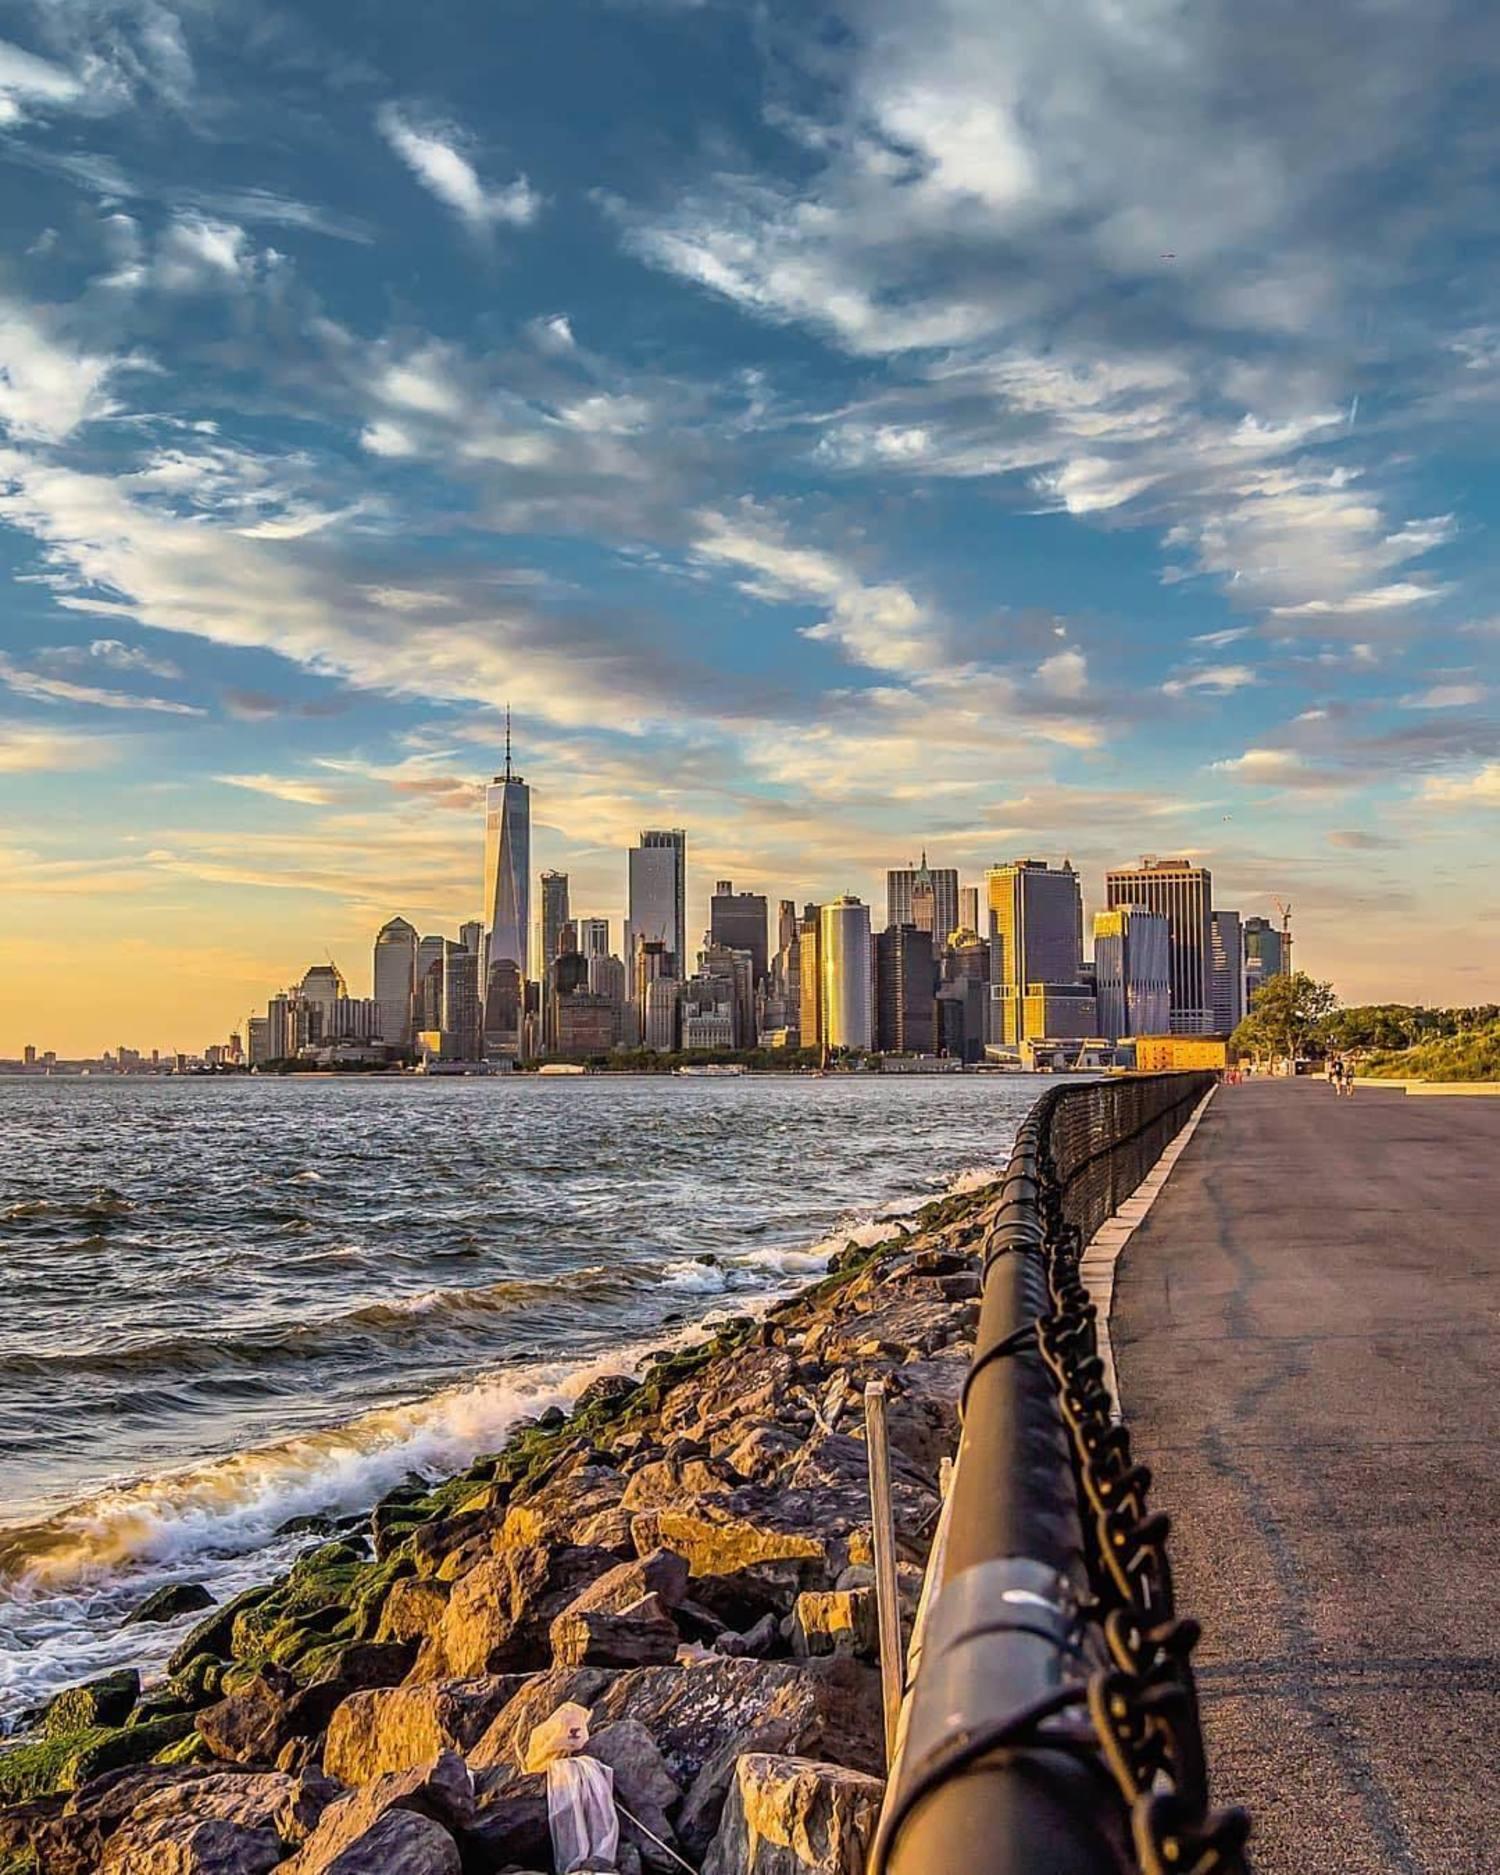 New York, New York. Photo via @everydayimshuttering #viewingnyc #newyork #newyorkcity #nyc